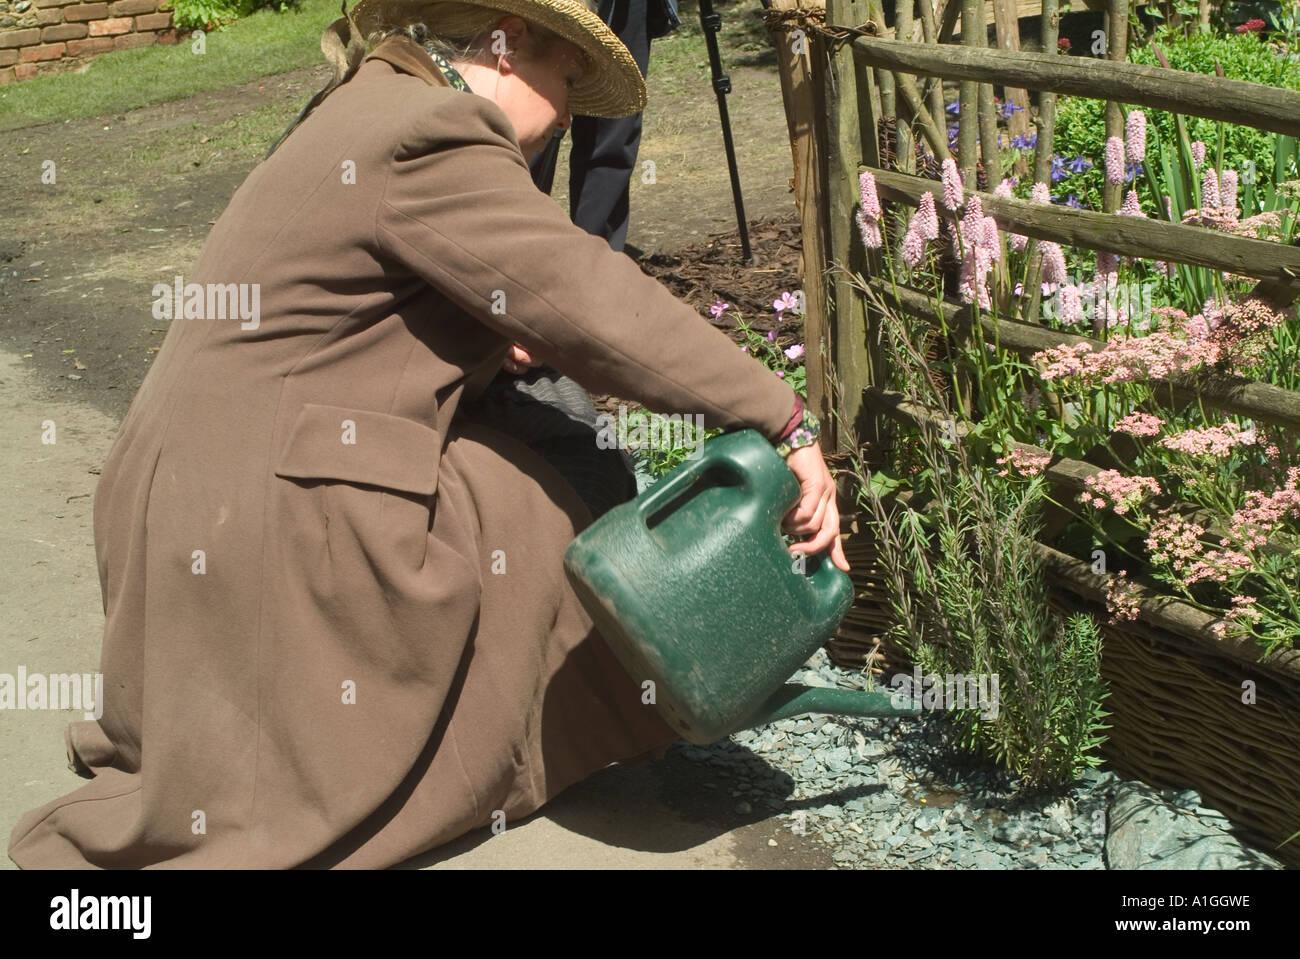 kim wilde garden designer watering the cumbrian fellside garden a courtyard garden stock image - Wilde Garden